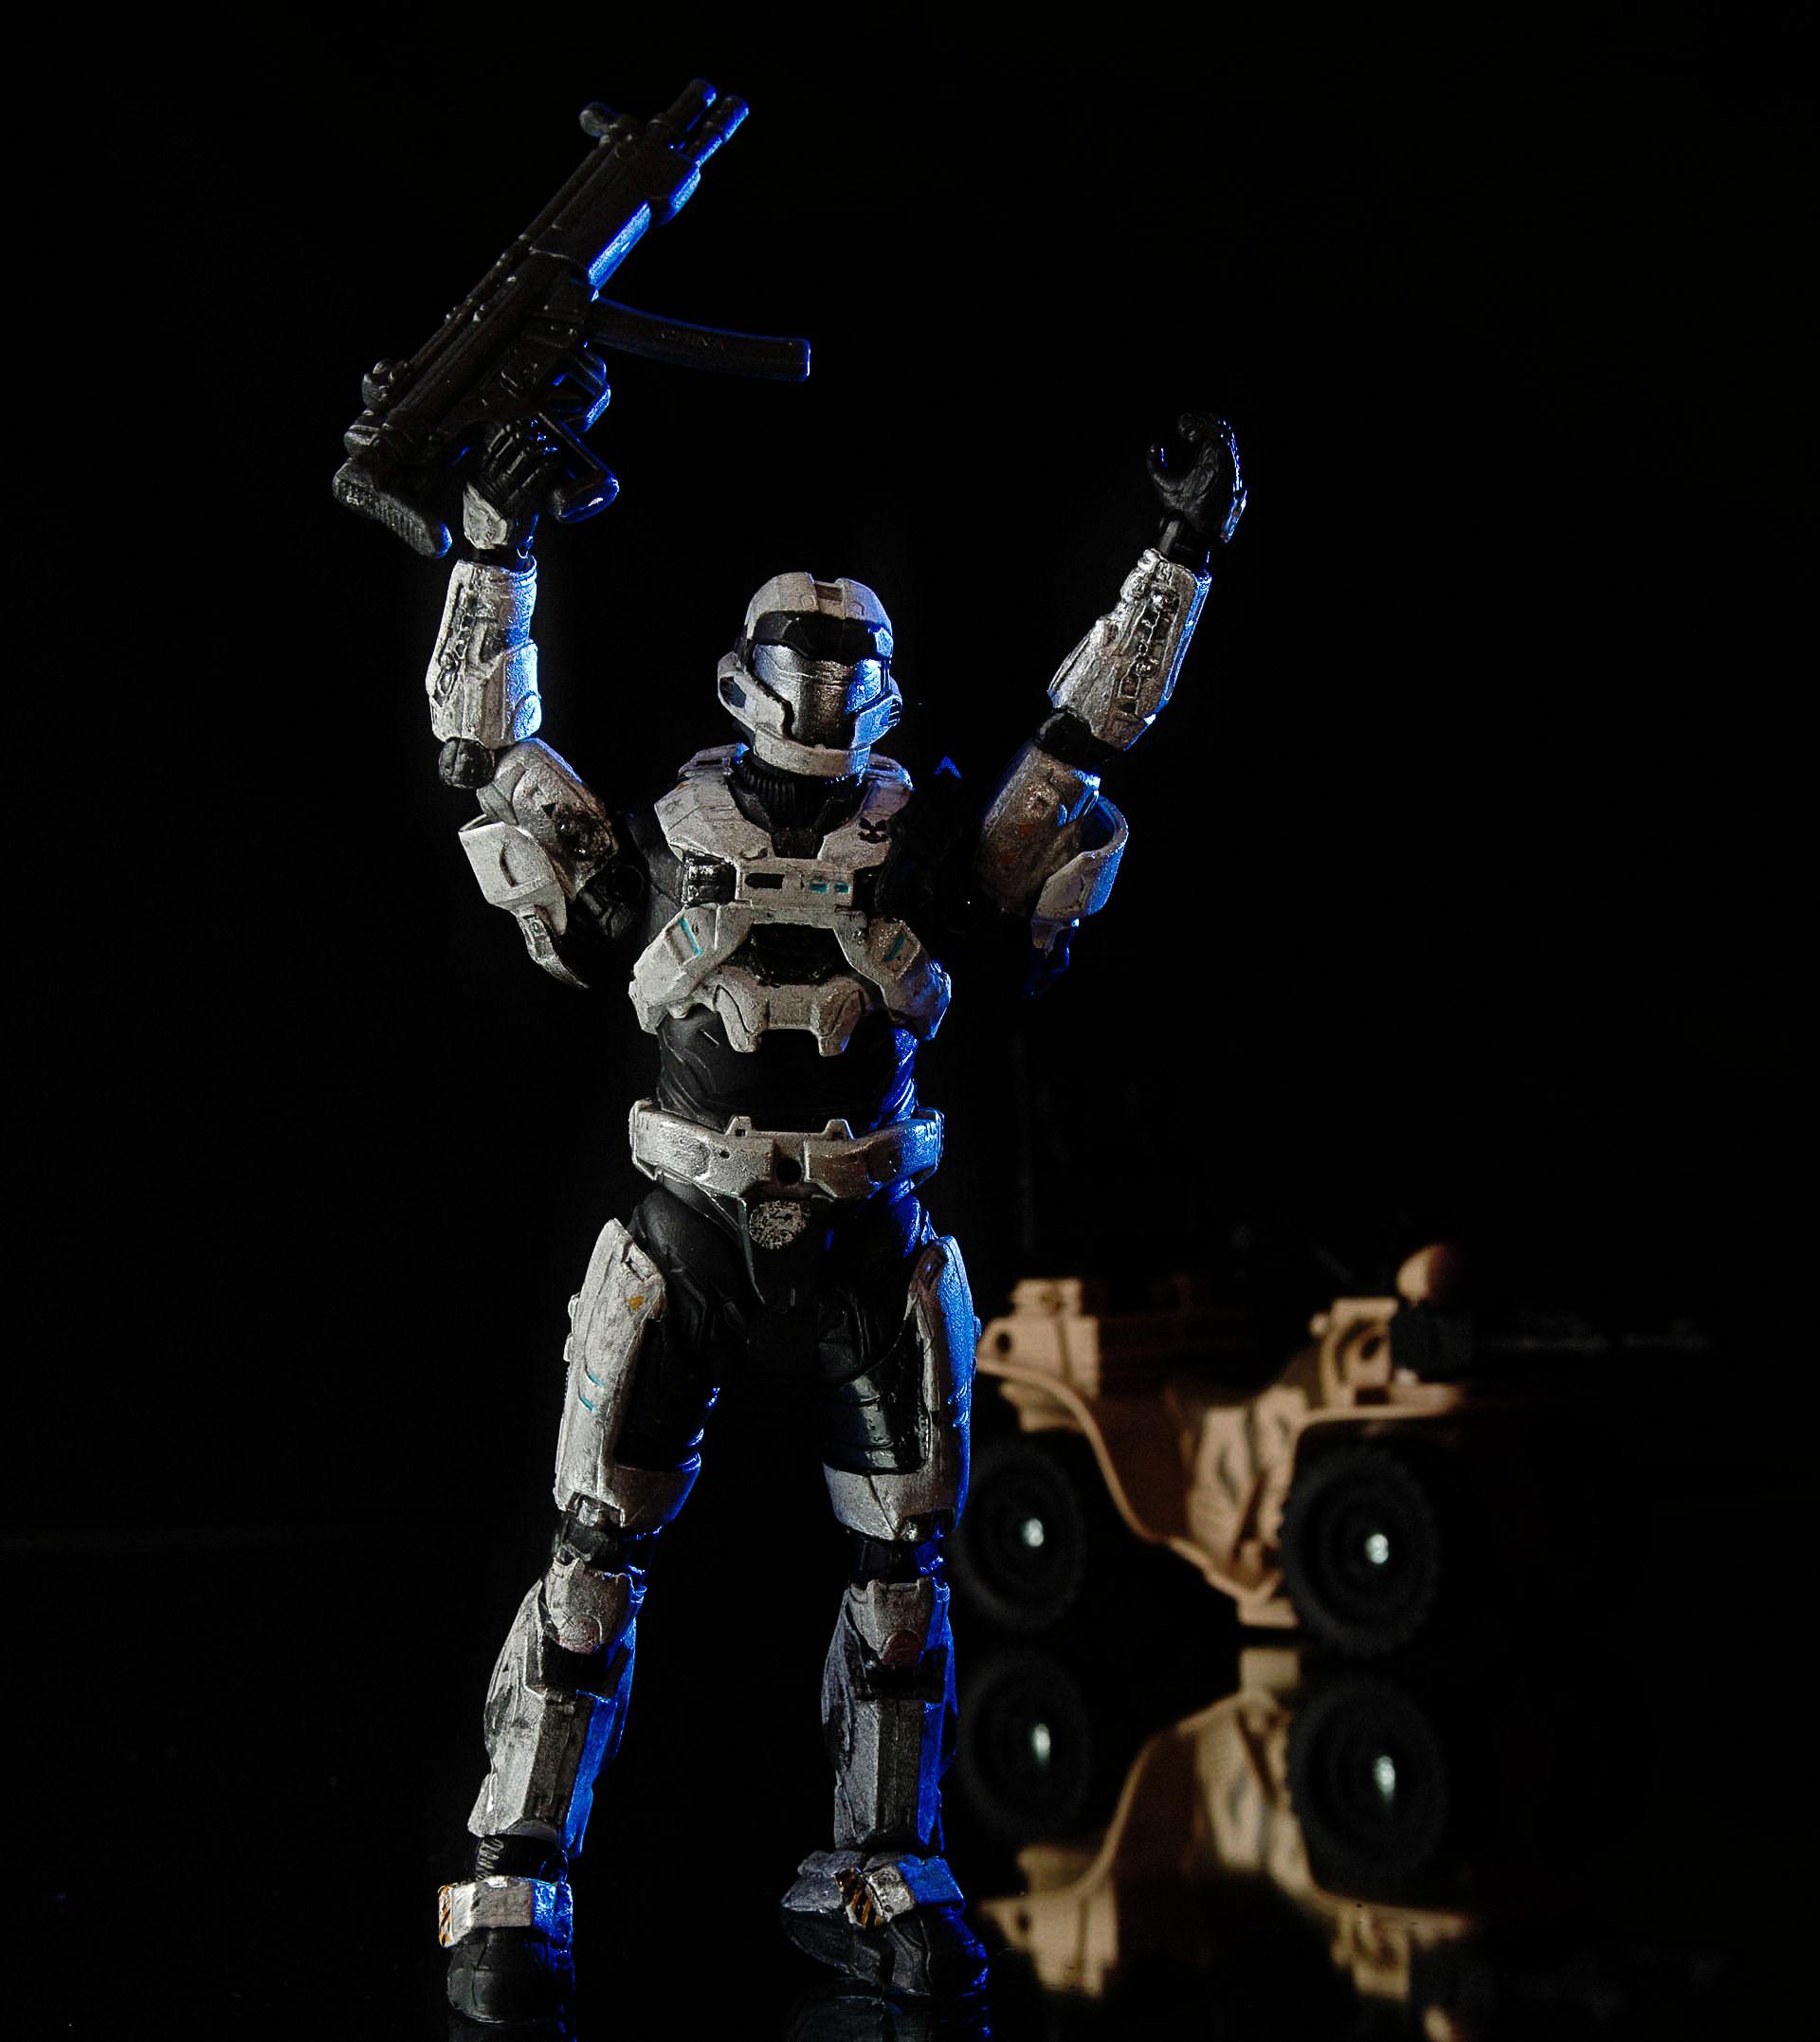 T.G.I.H.F (Thank God it's Halo Friday)